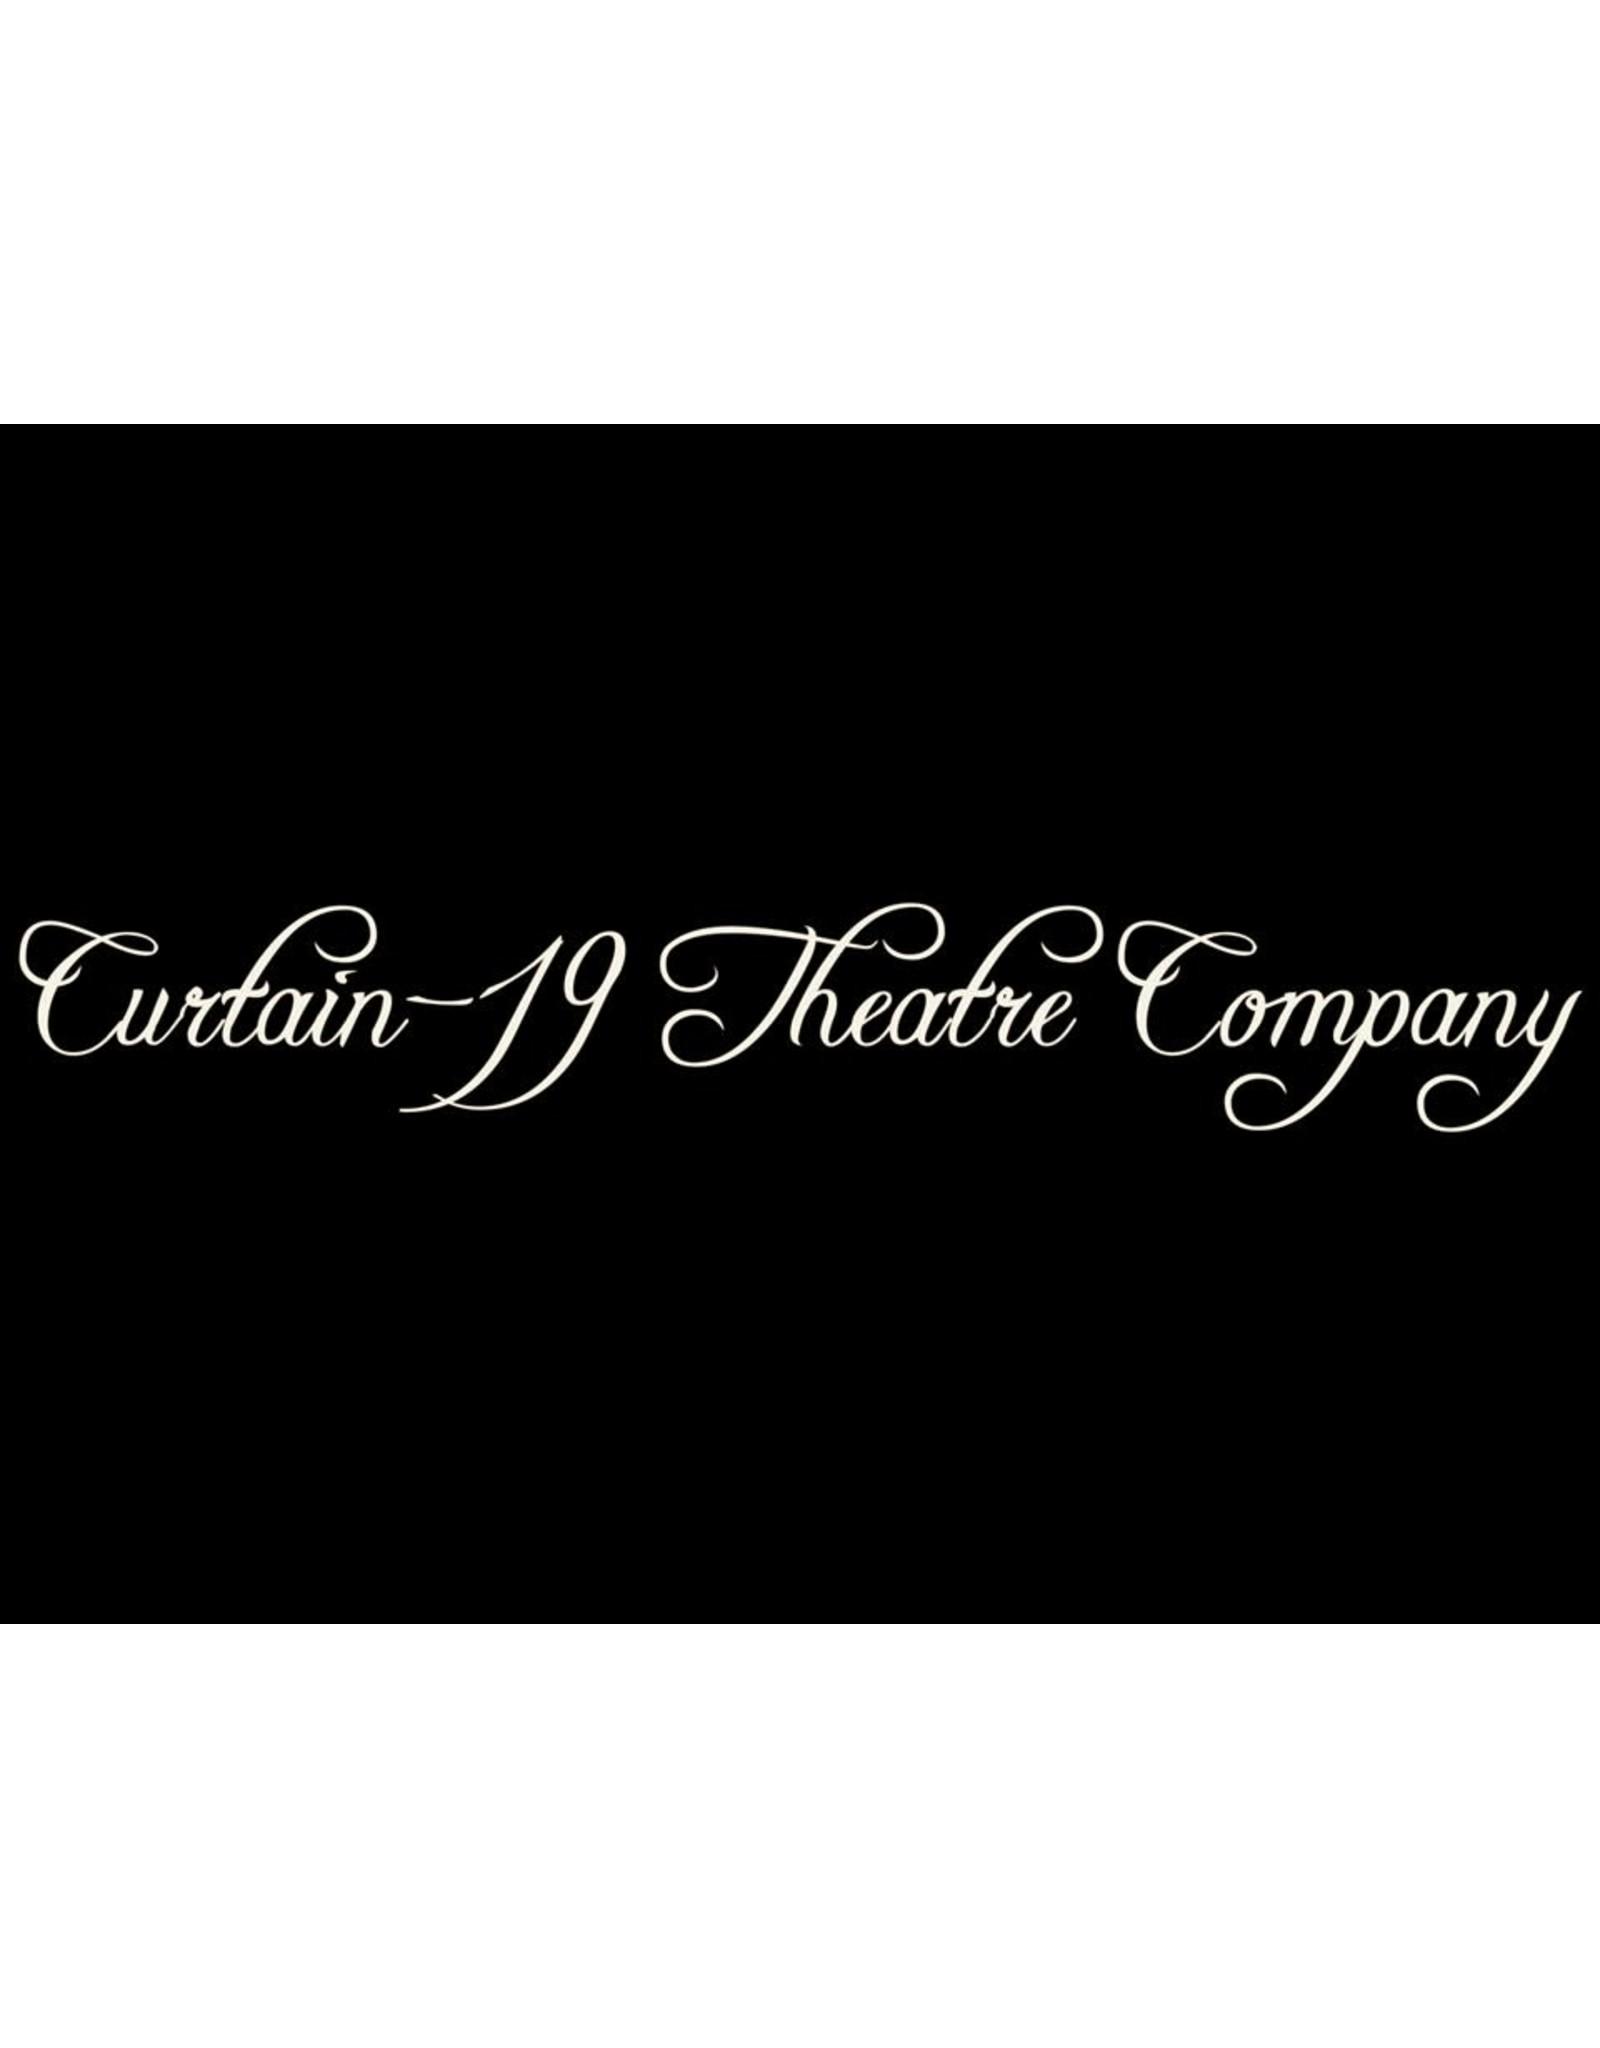 Curtain-19 T-Shirt